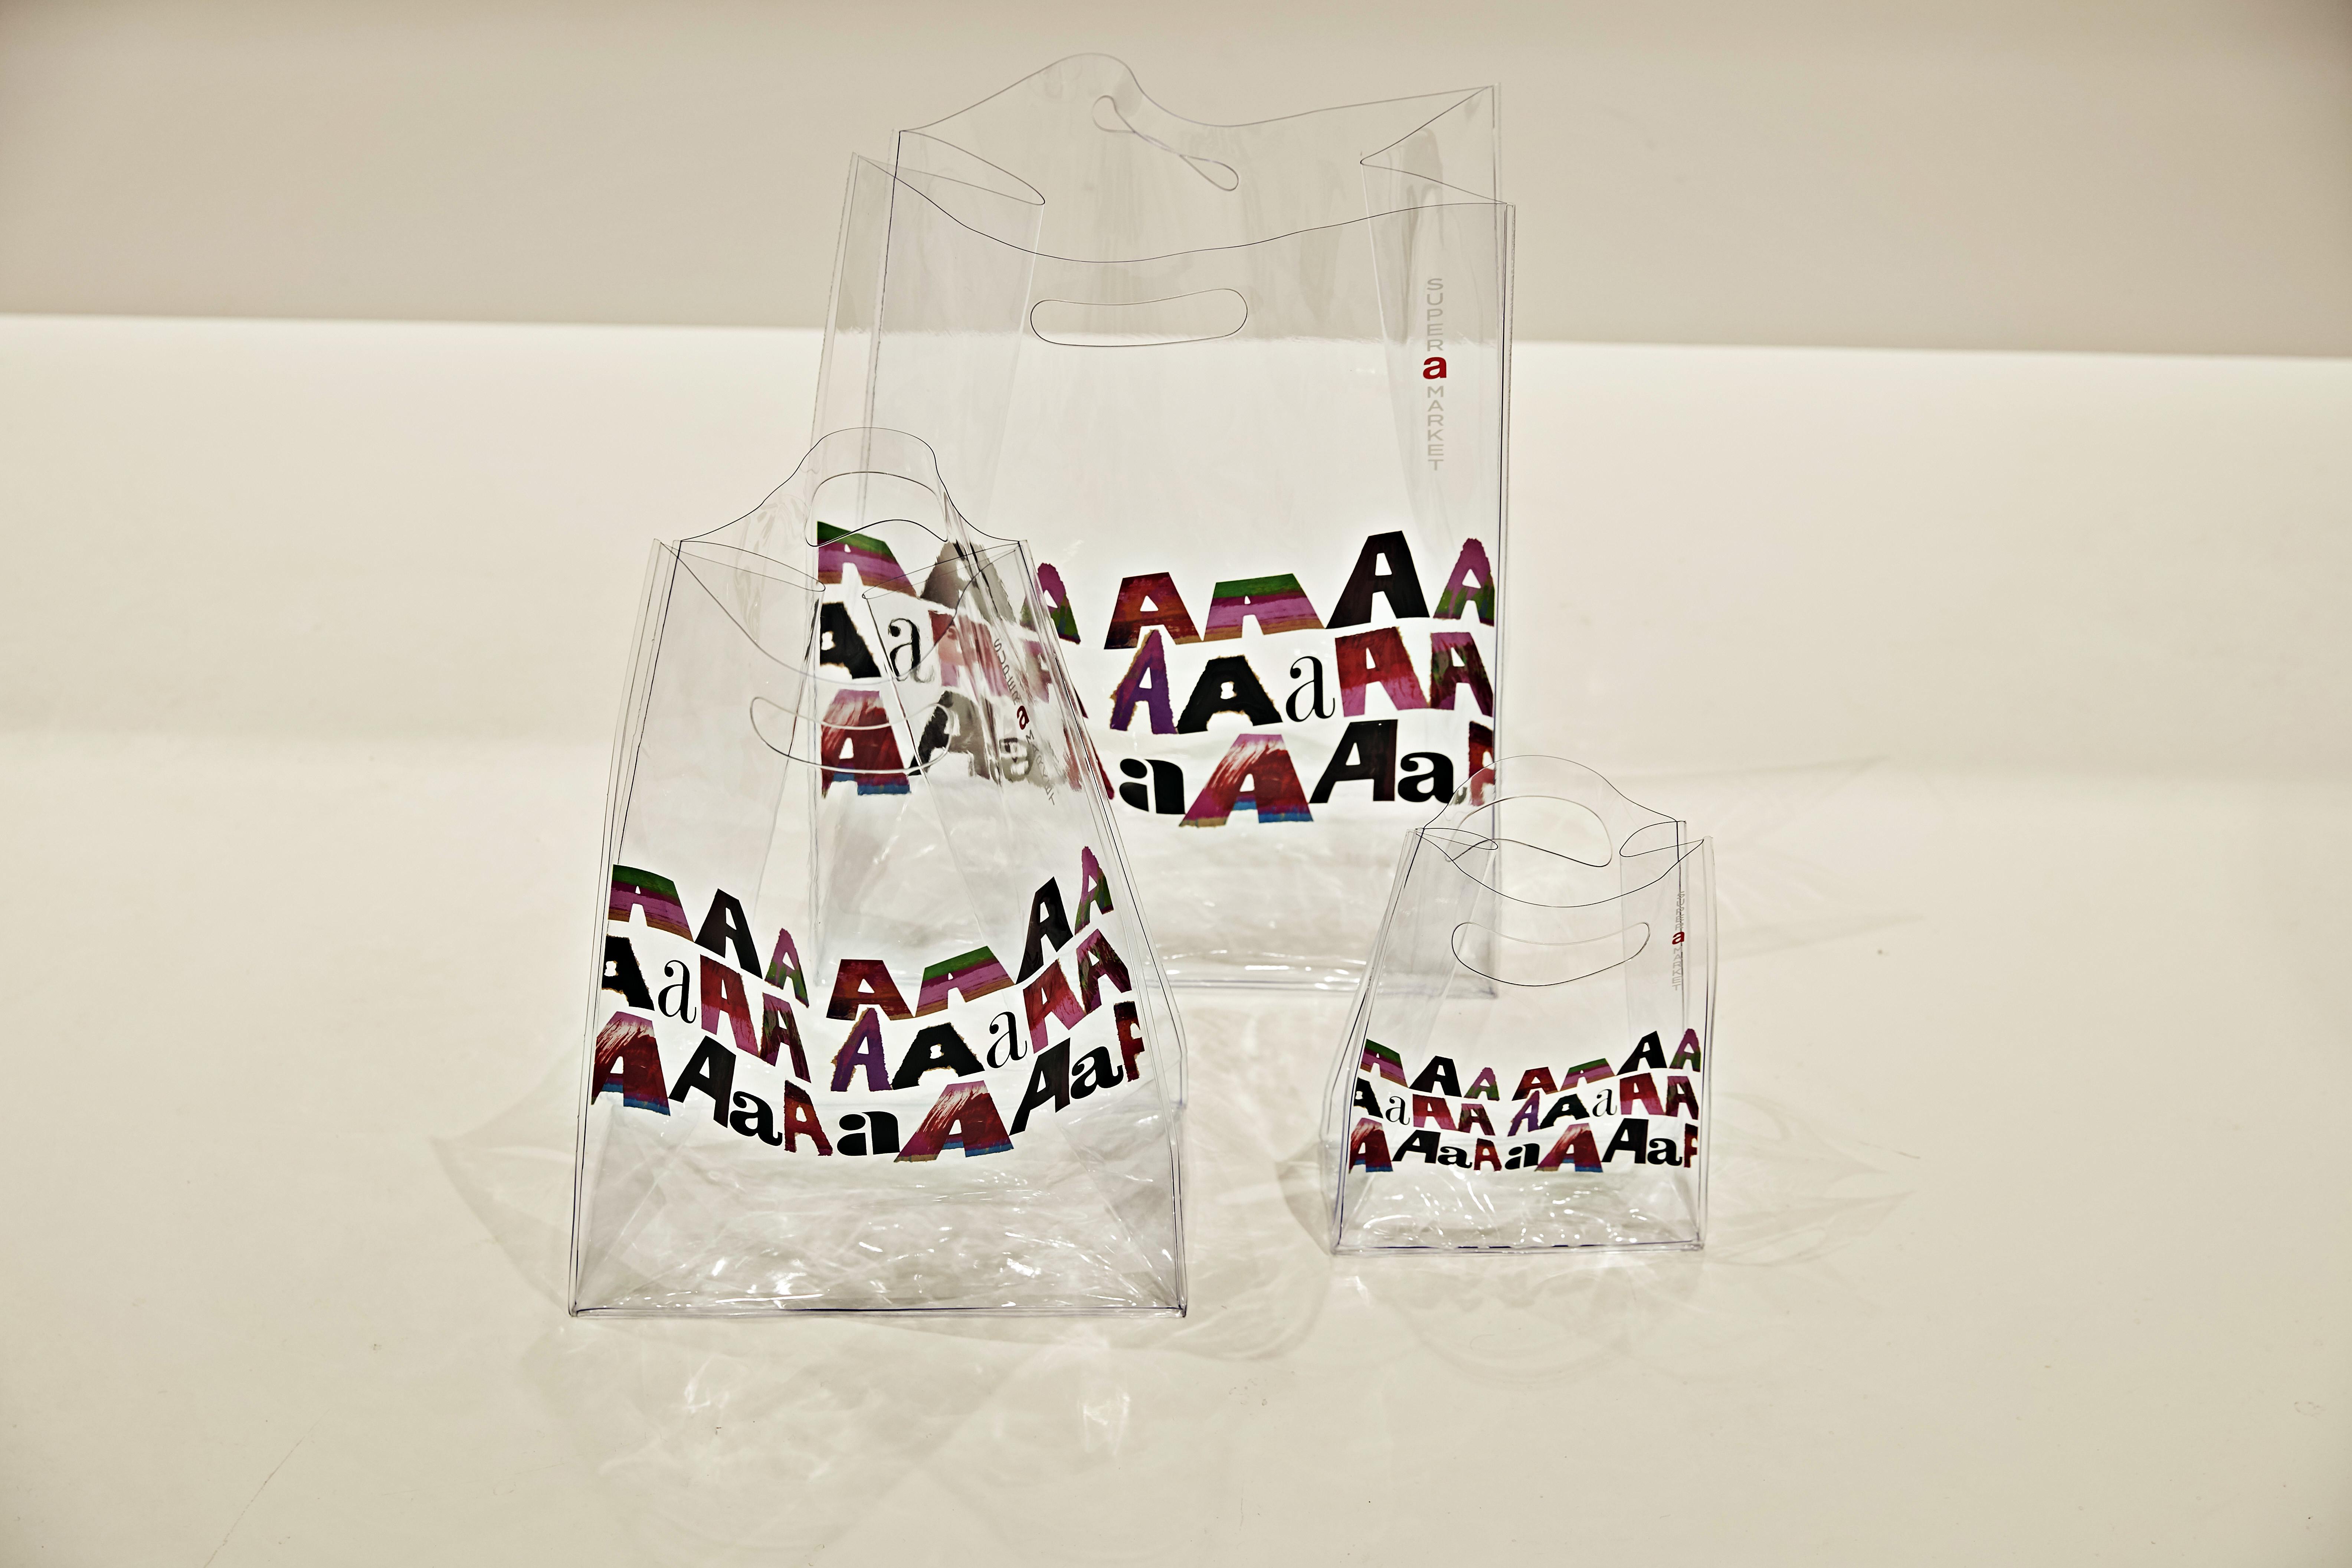 PVCバッグ 大 ¥3,000 中 ¥2,000 小 ¥1,000 ※数量限定、なくなり次第終了